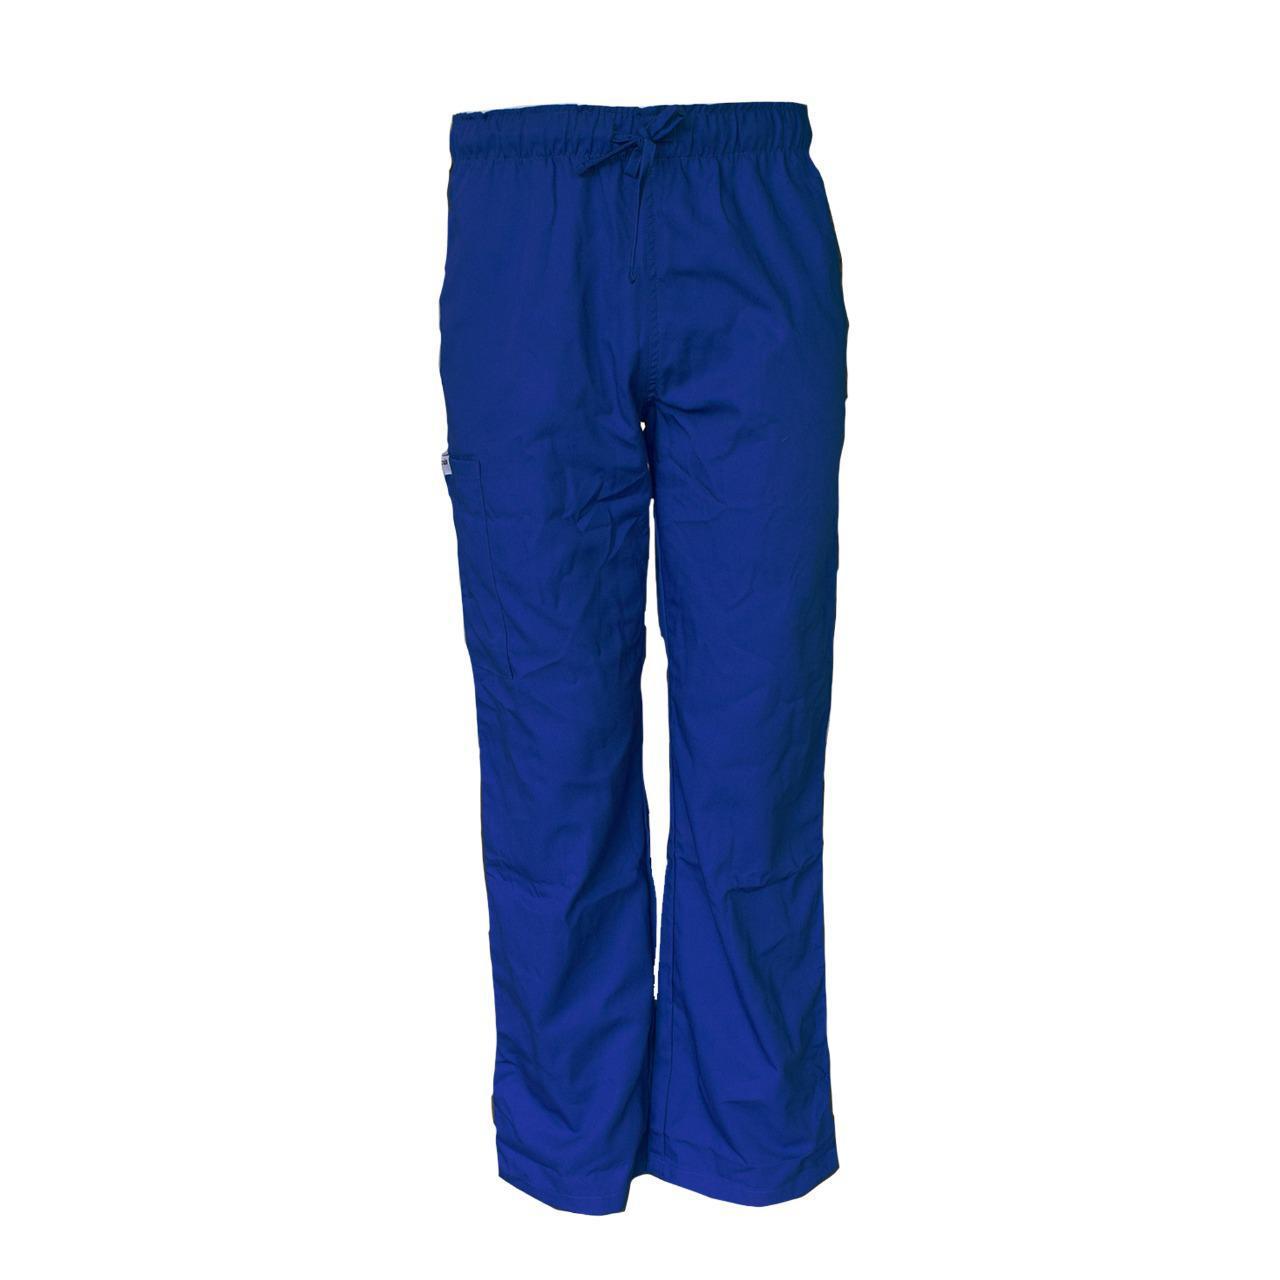 Pantalon hombre az nacional